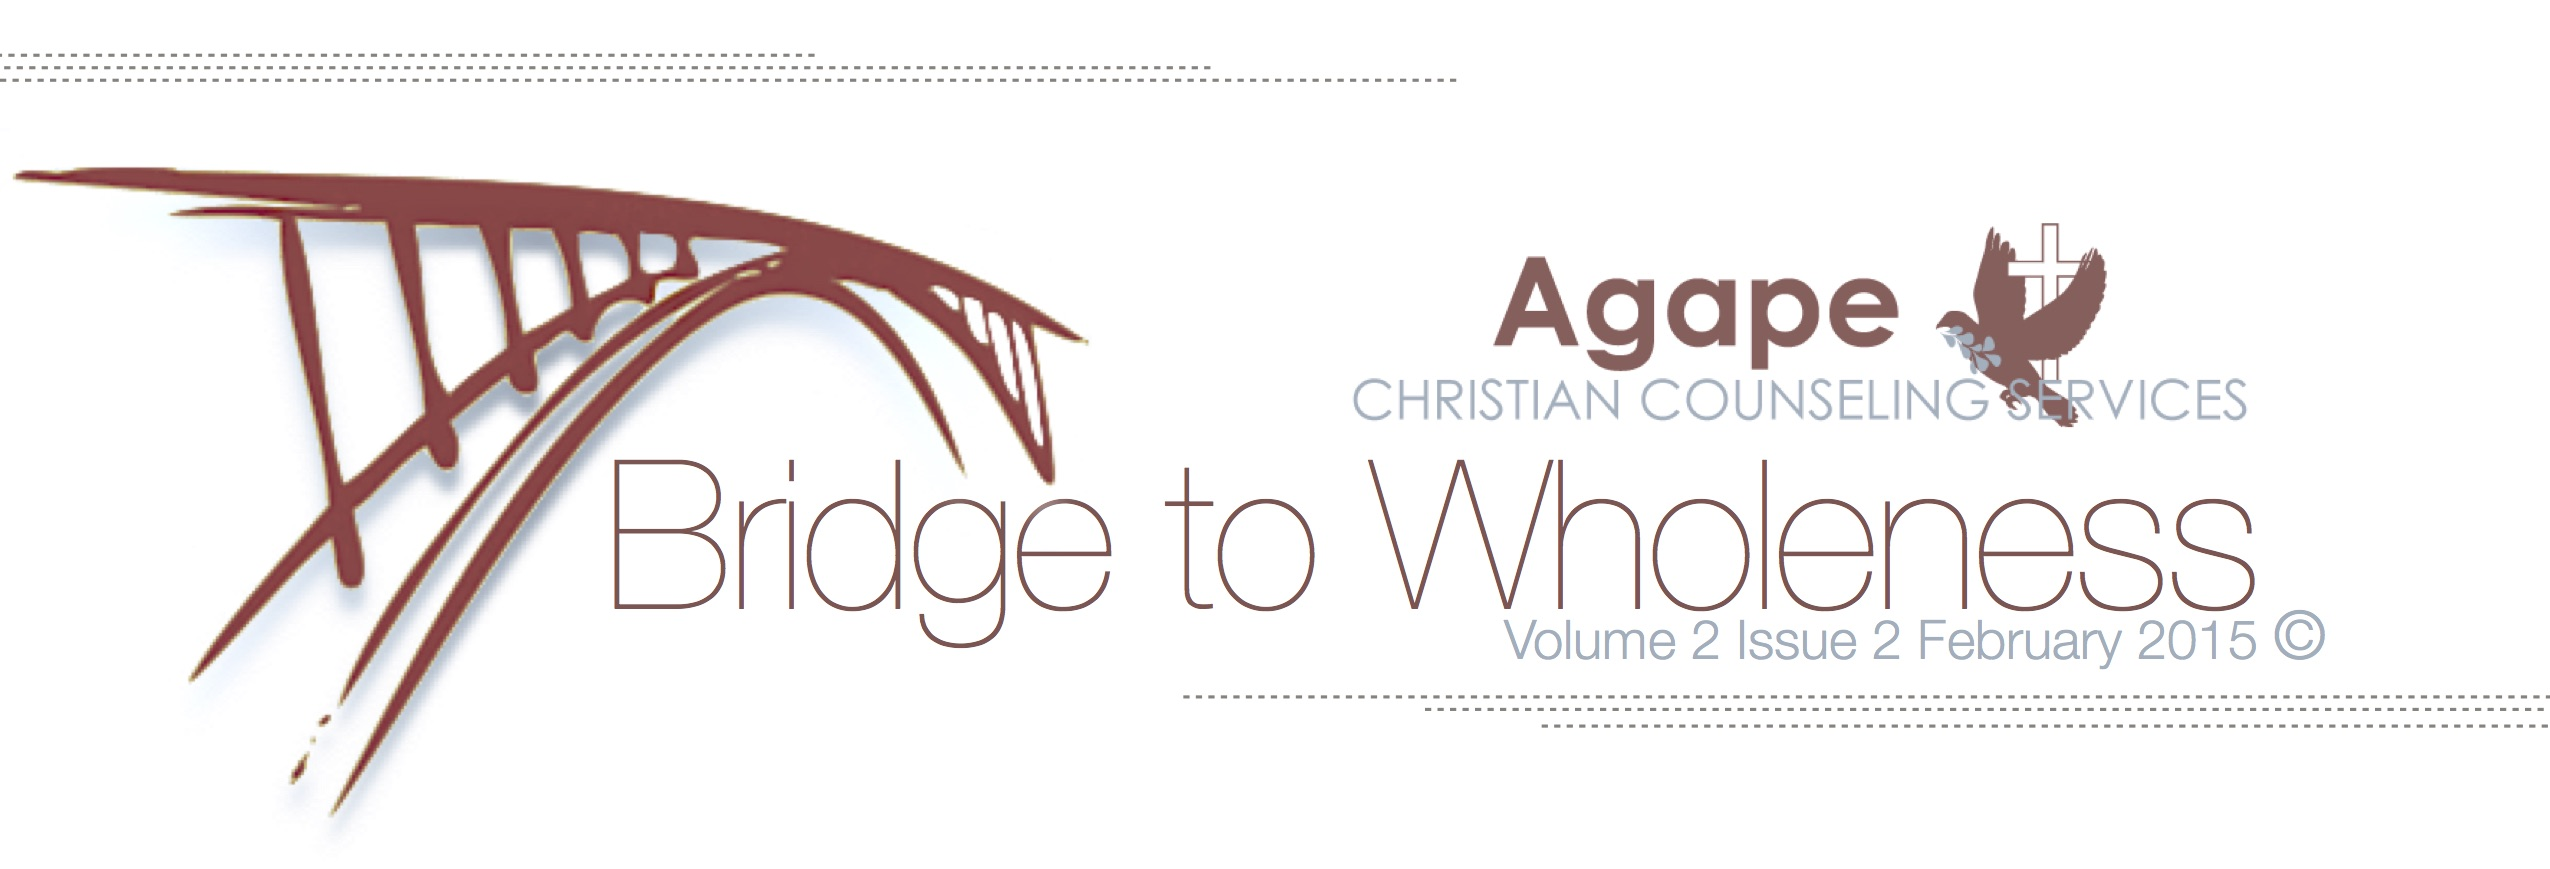 February 2015 Bridge to Wholeness Newsletter